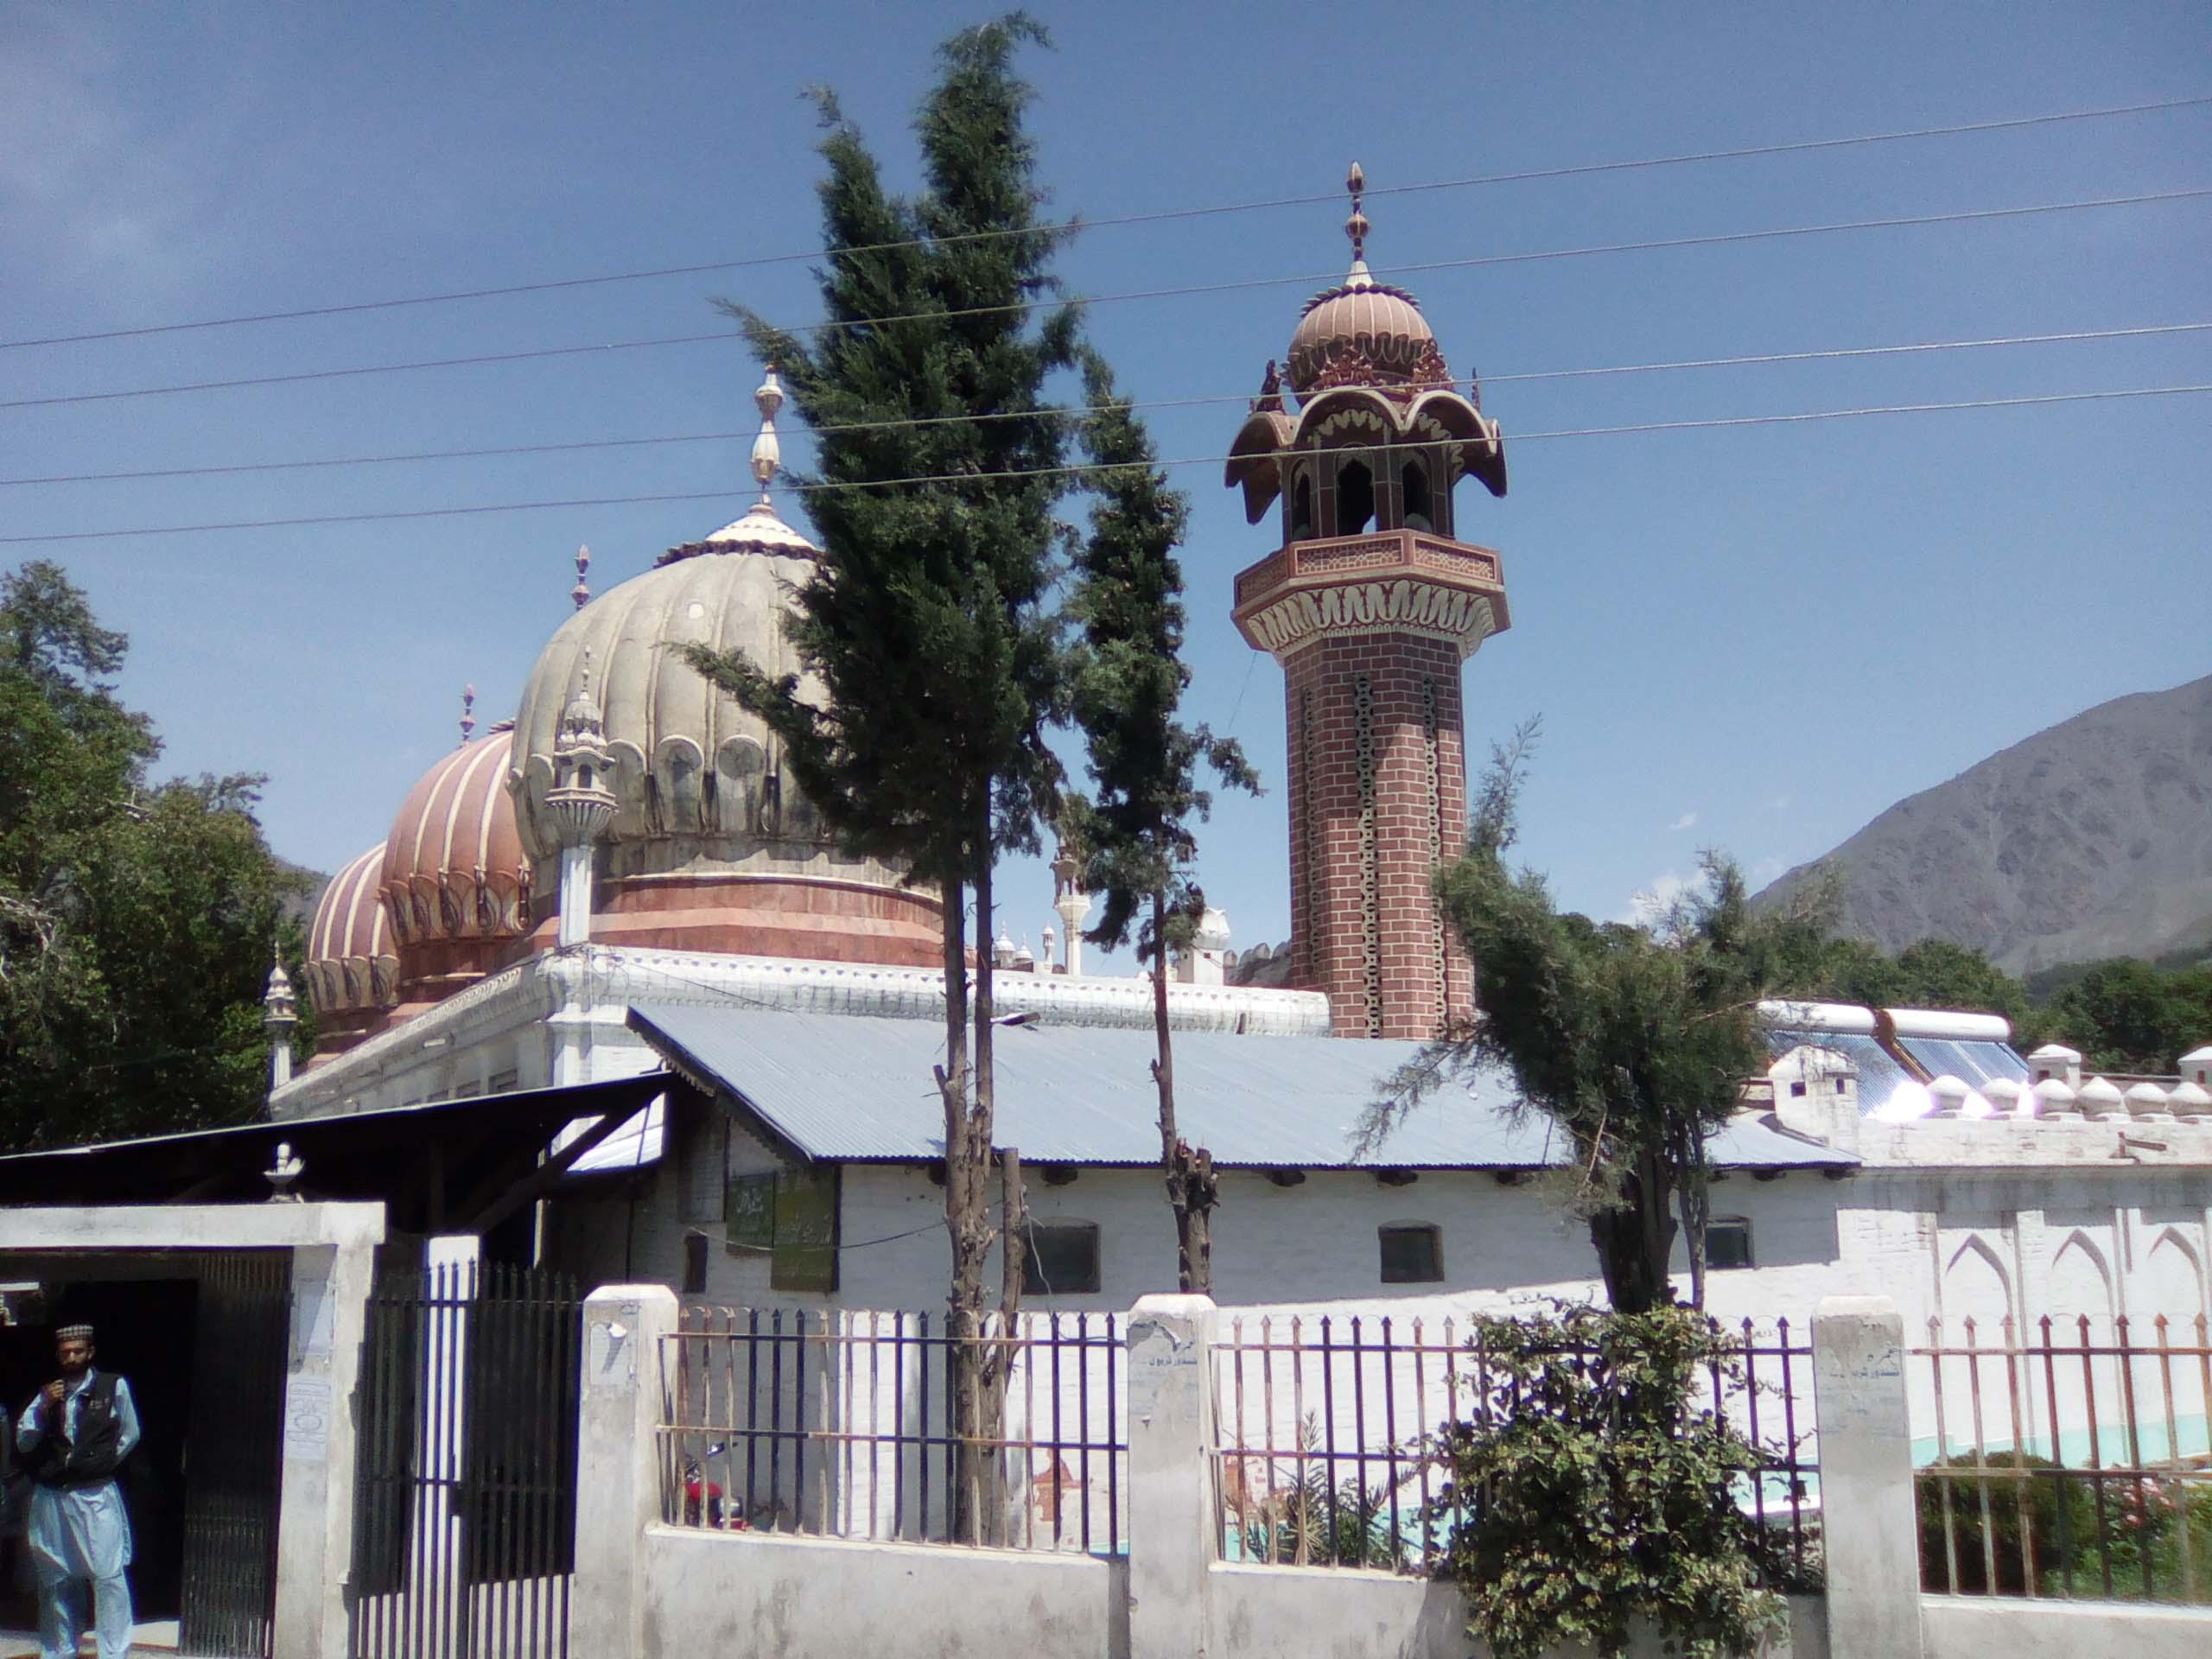 چترال: سخت سیکیورٹی میں نماز جمعہ کی ادائیگی